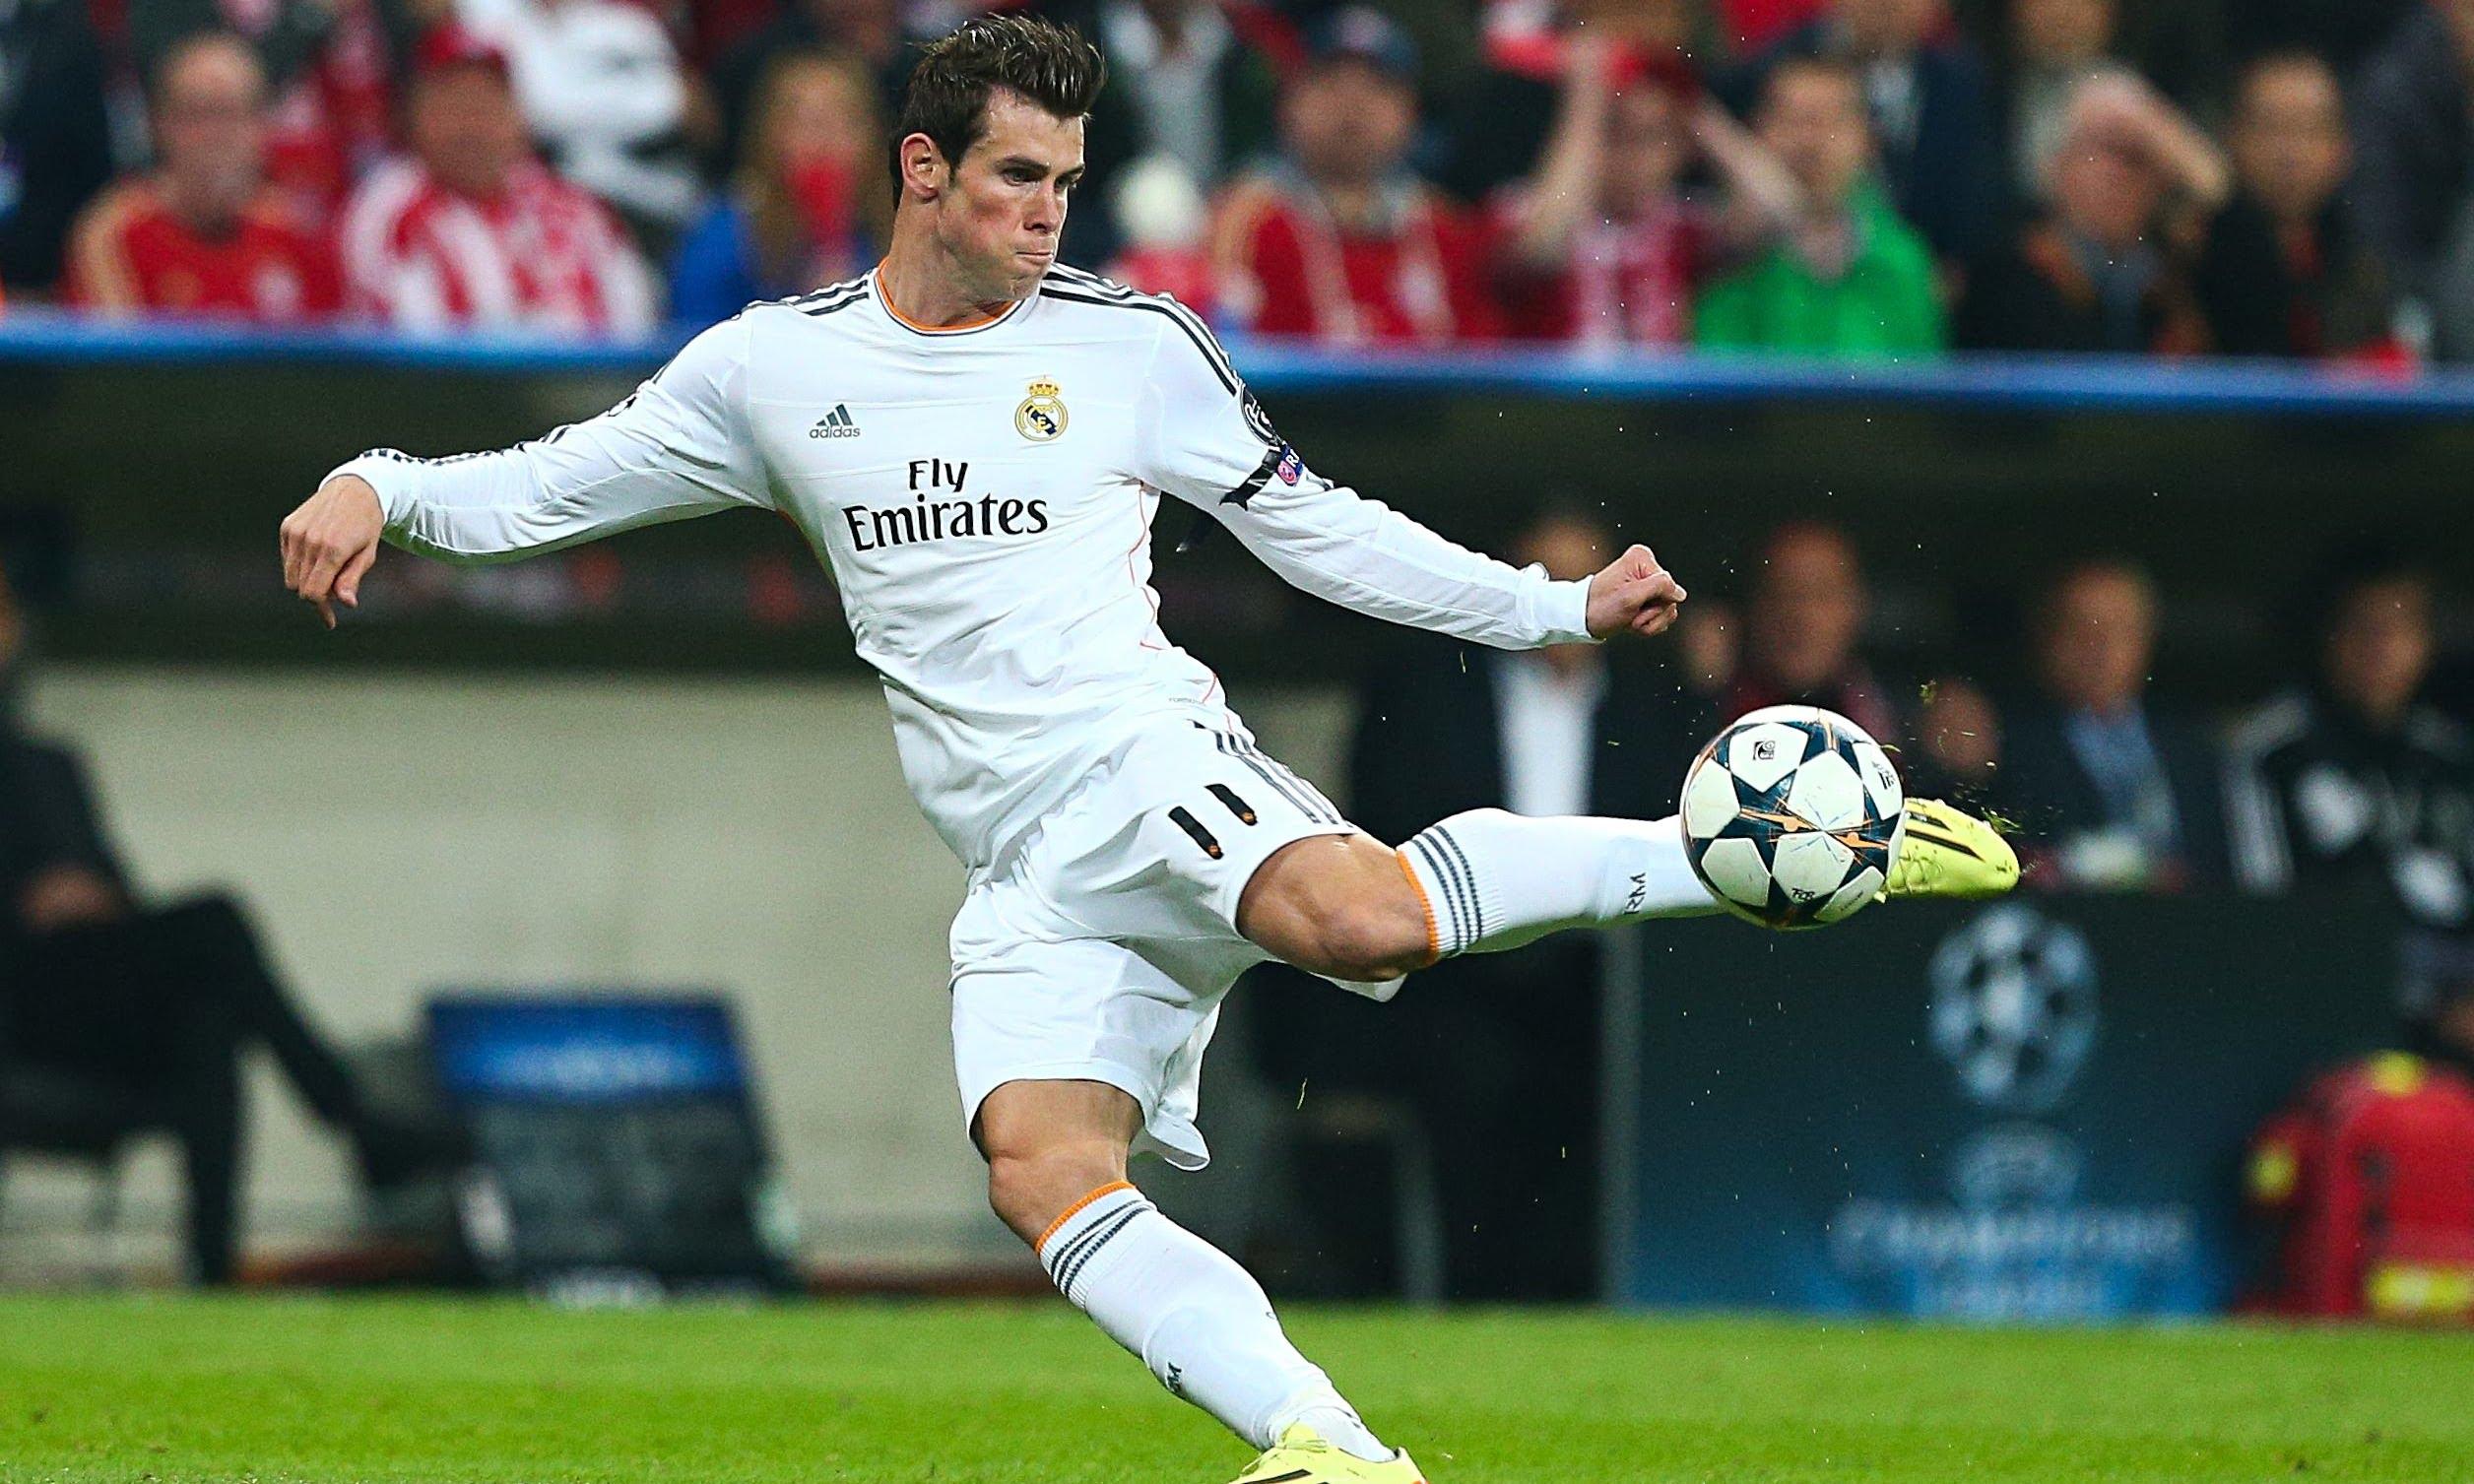 Gareth Bale Left Foot